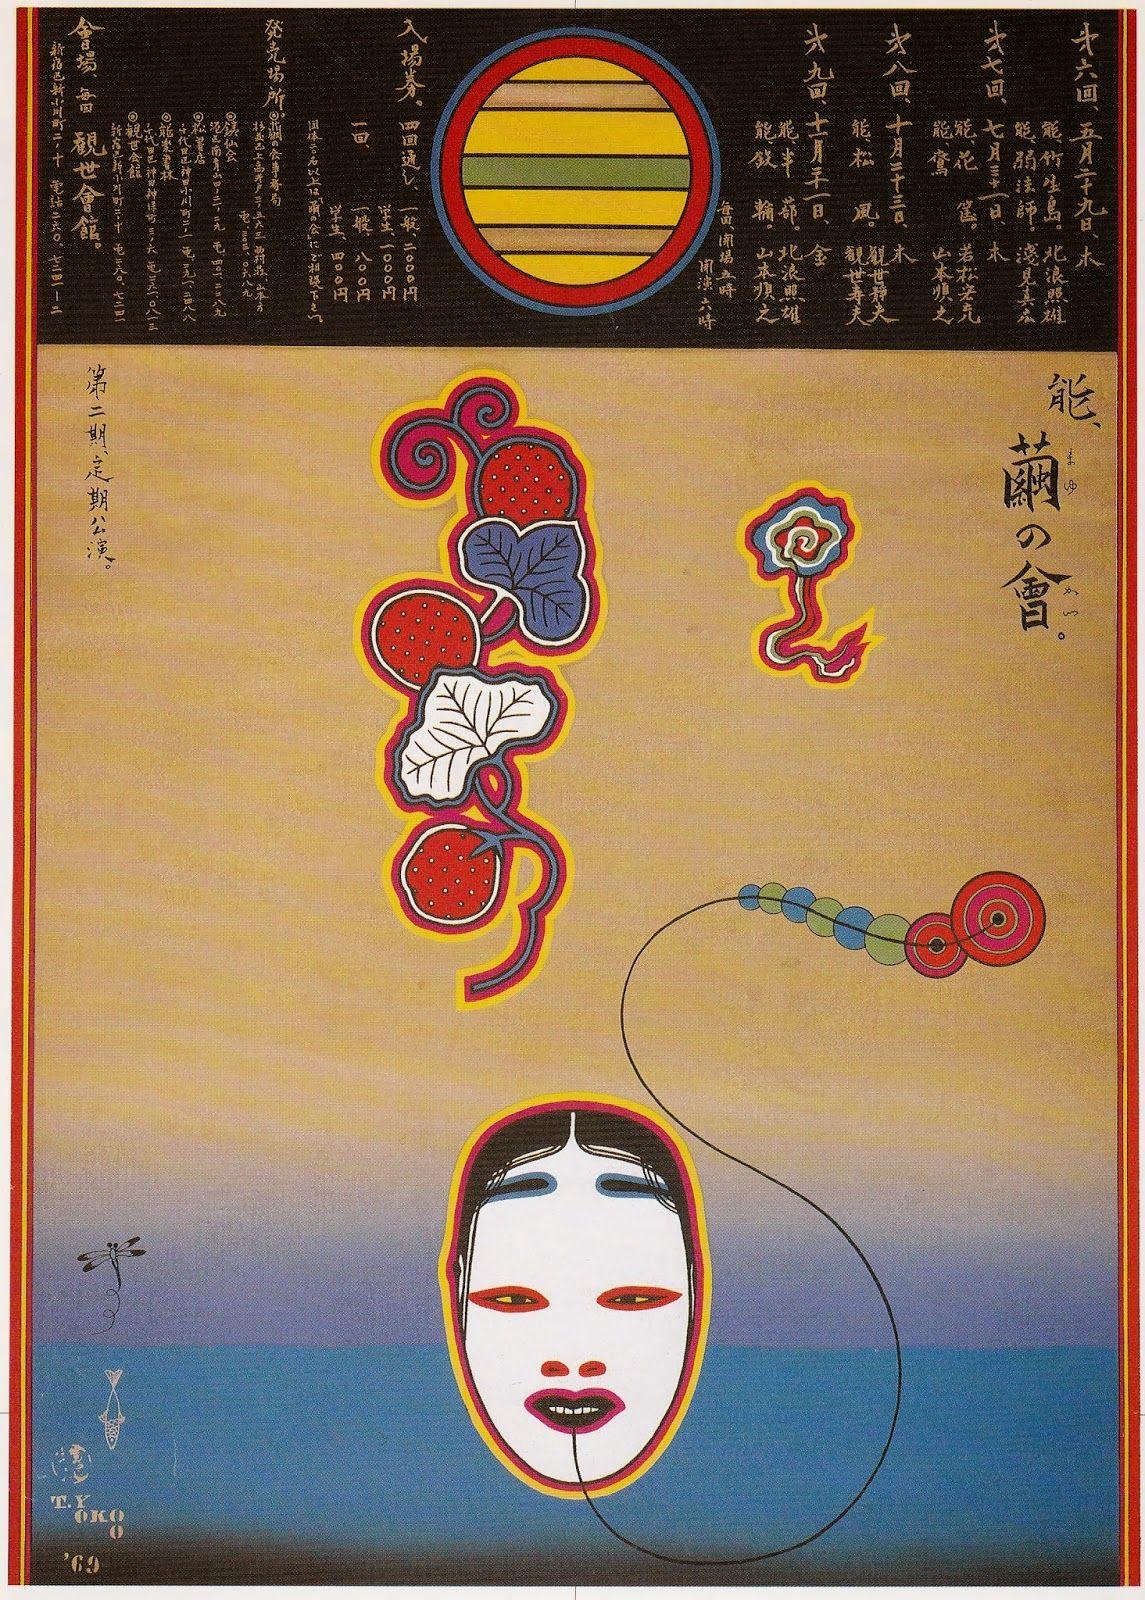 tadanori+yokoo_0005.jpg (1145×1600)